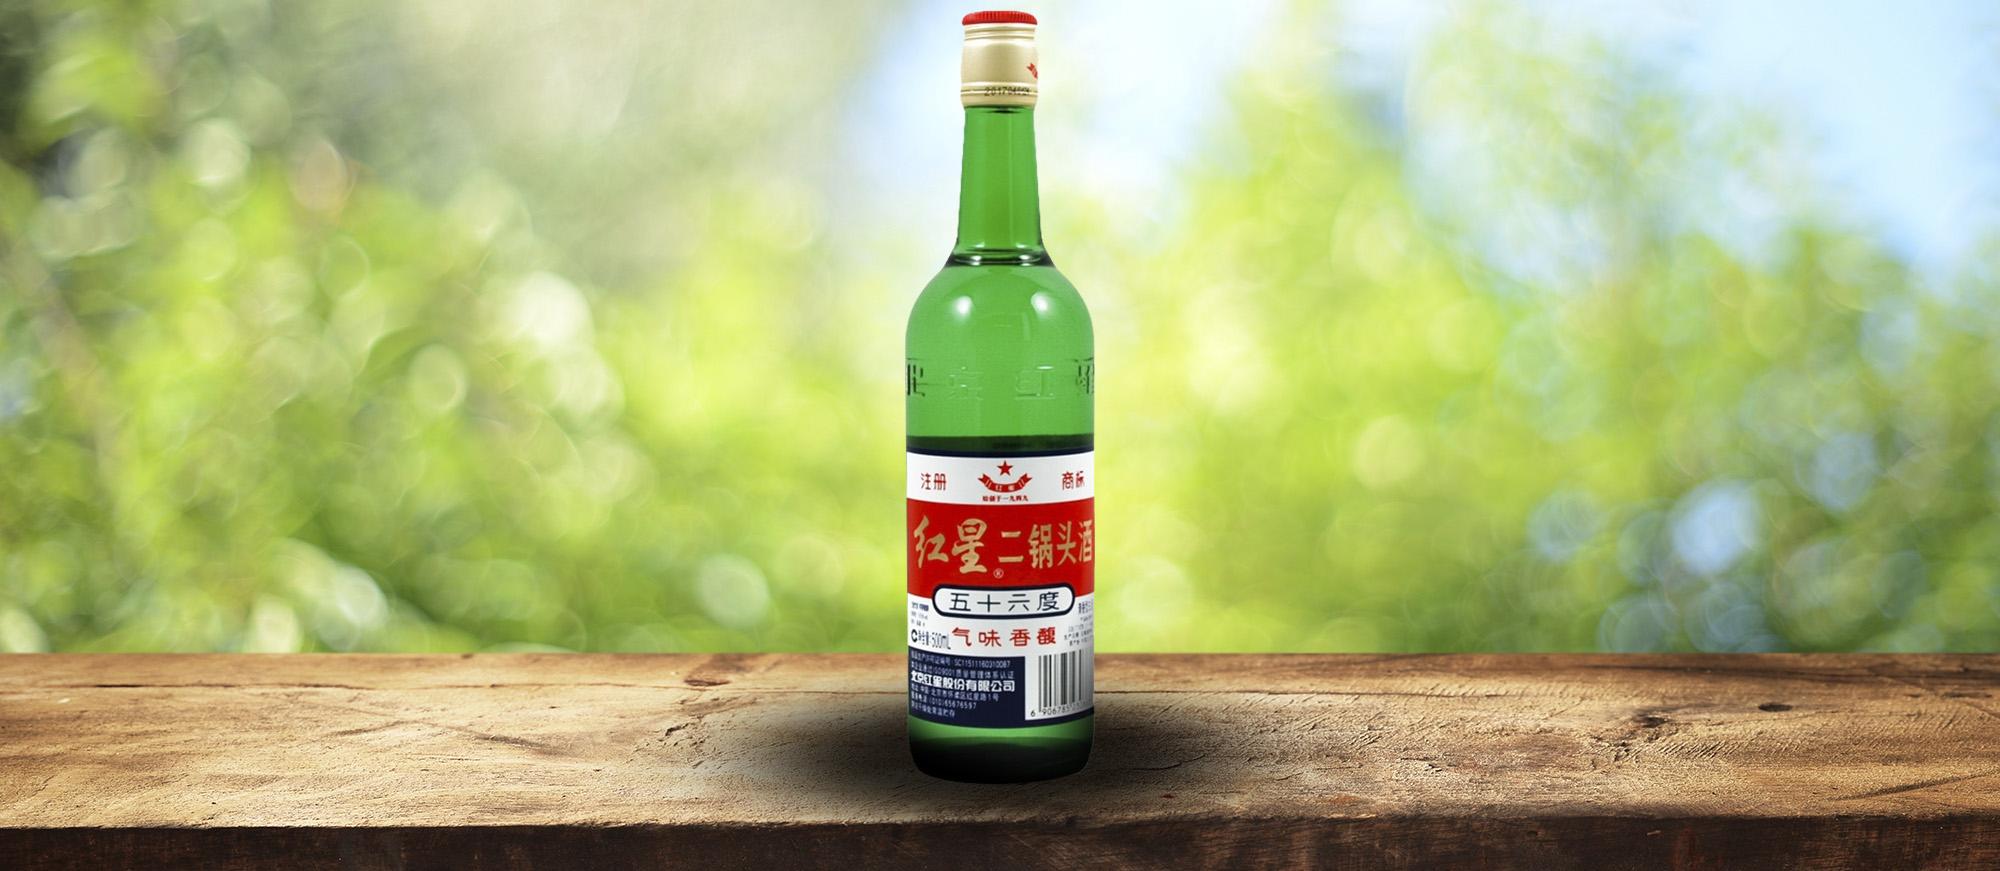 5 Most Popular Chinese Spirits And Liqueurs - TasteAtlas